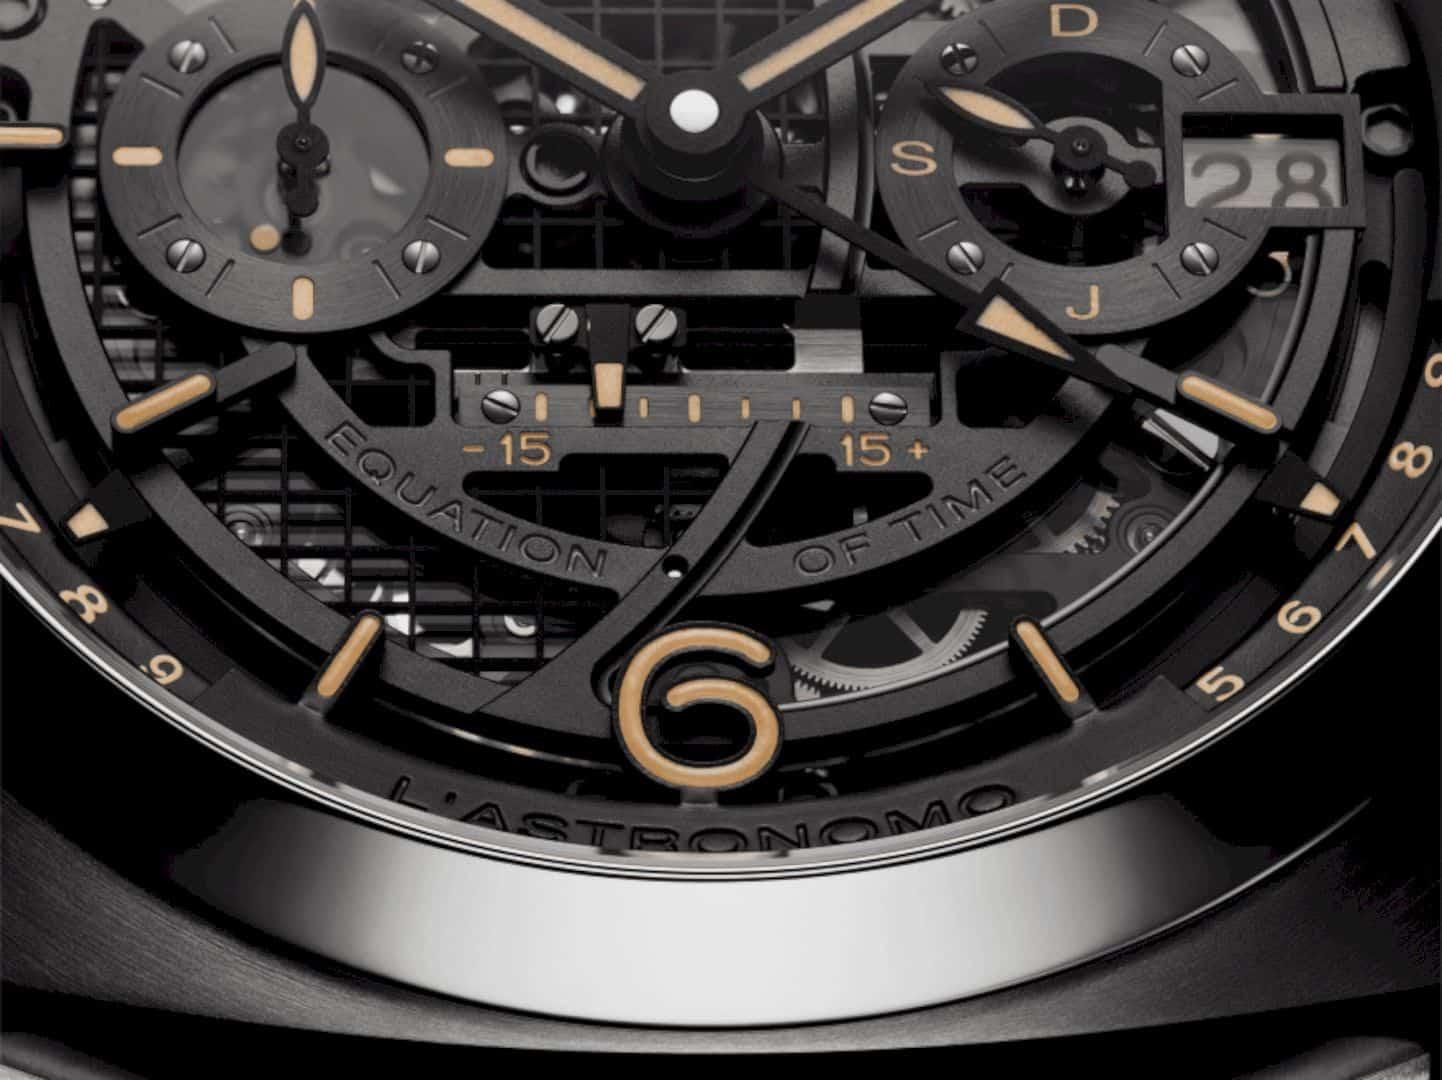 L'Astronomo Luminor 1950 Tourbillon Watch 5